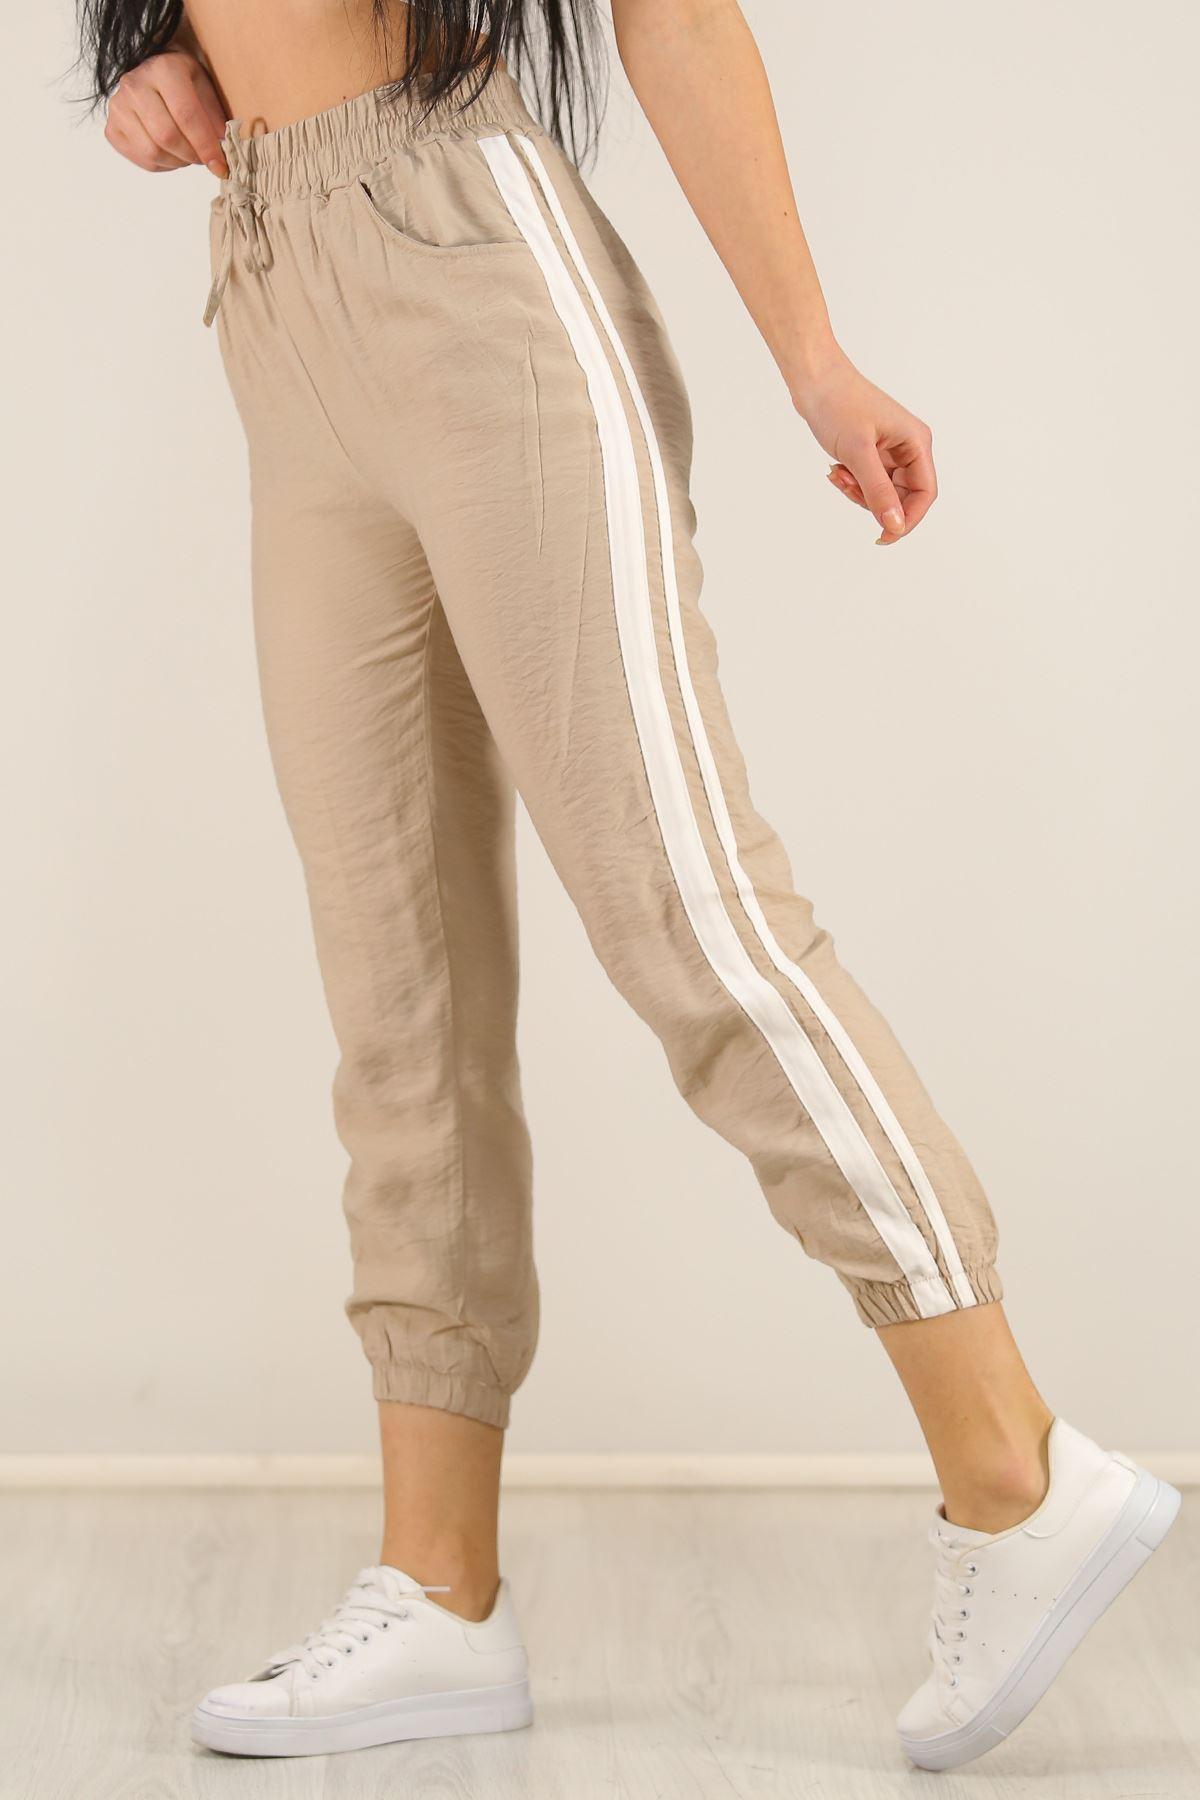 Şeritli Ayrobin Spor Pantolon Taş - 5750.107.